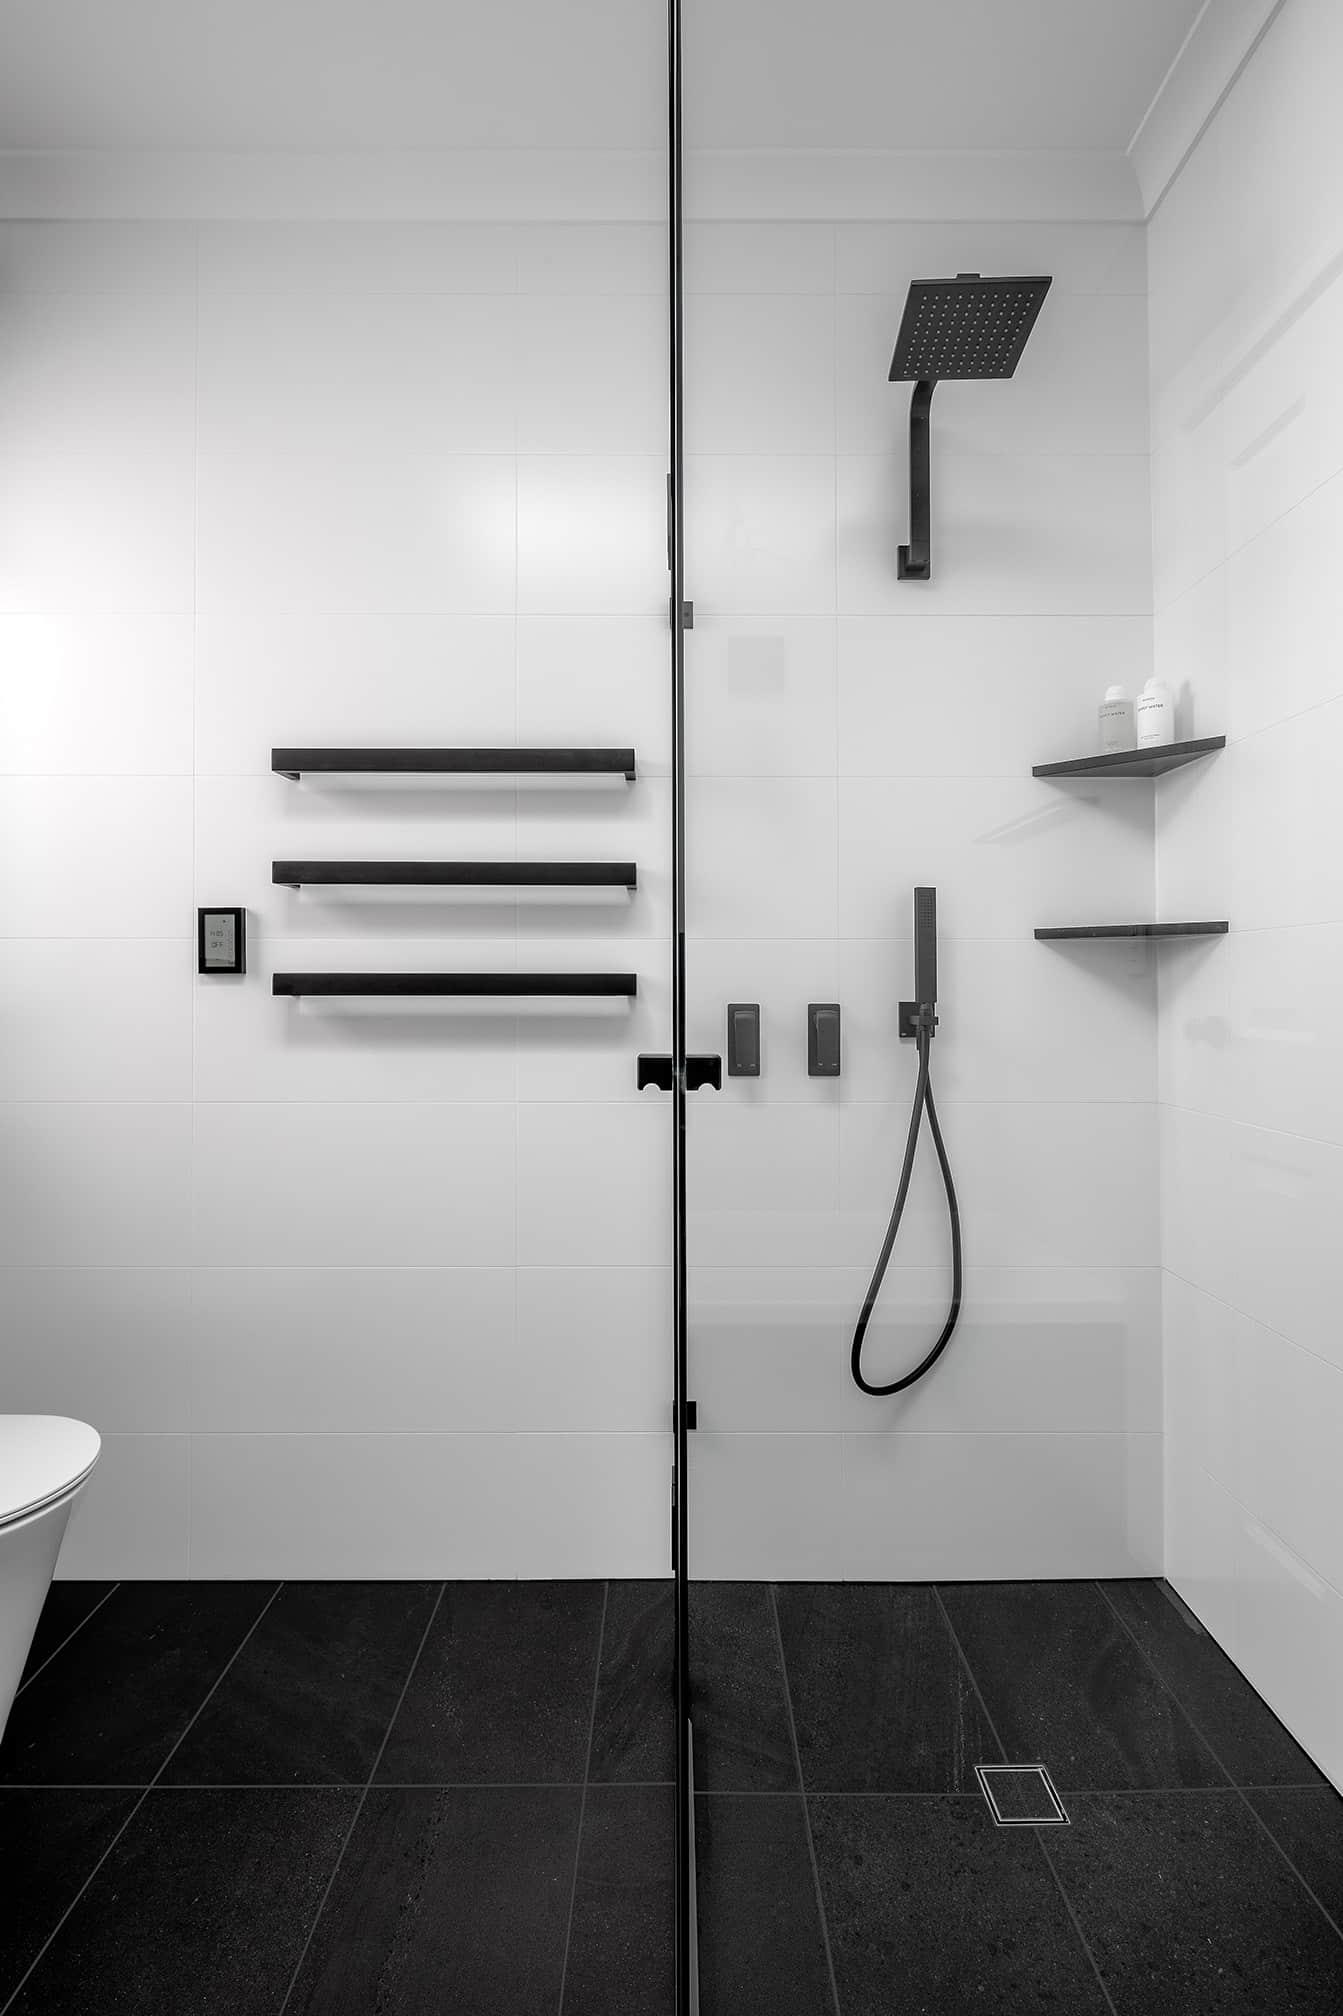 Monochrome Main Bathroom toilet and shower